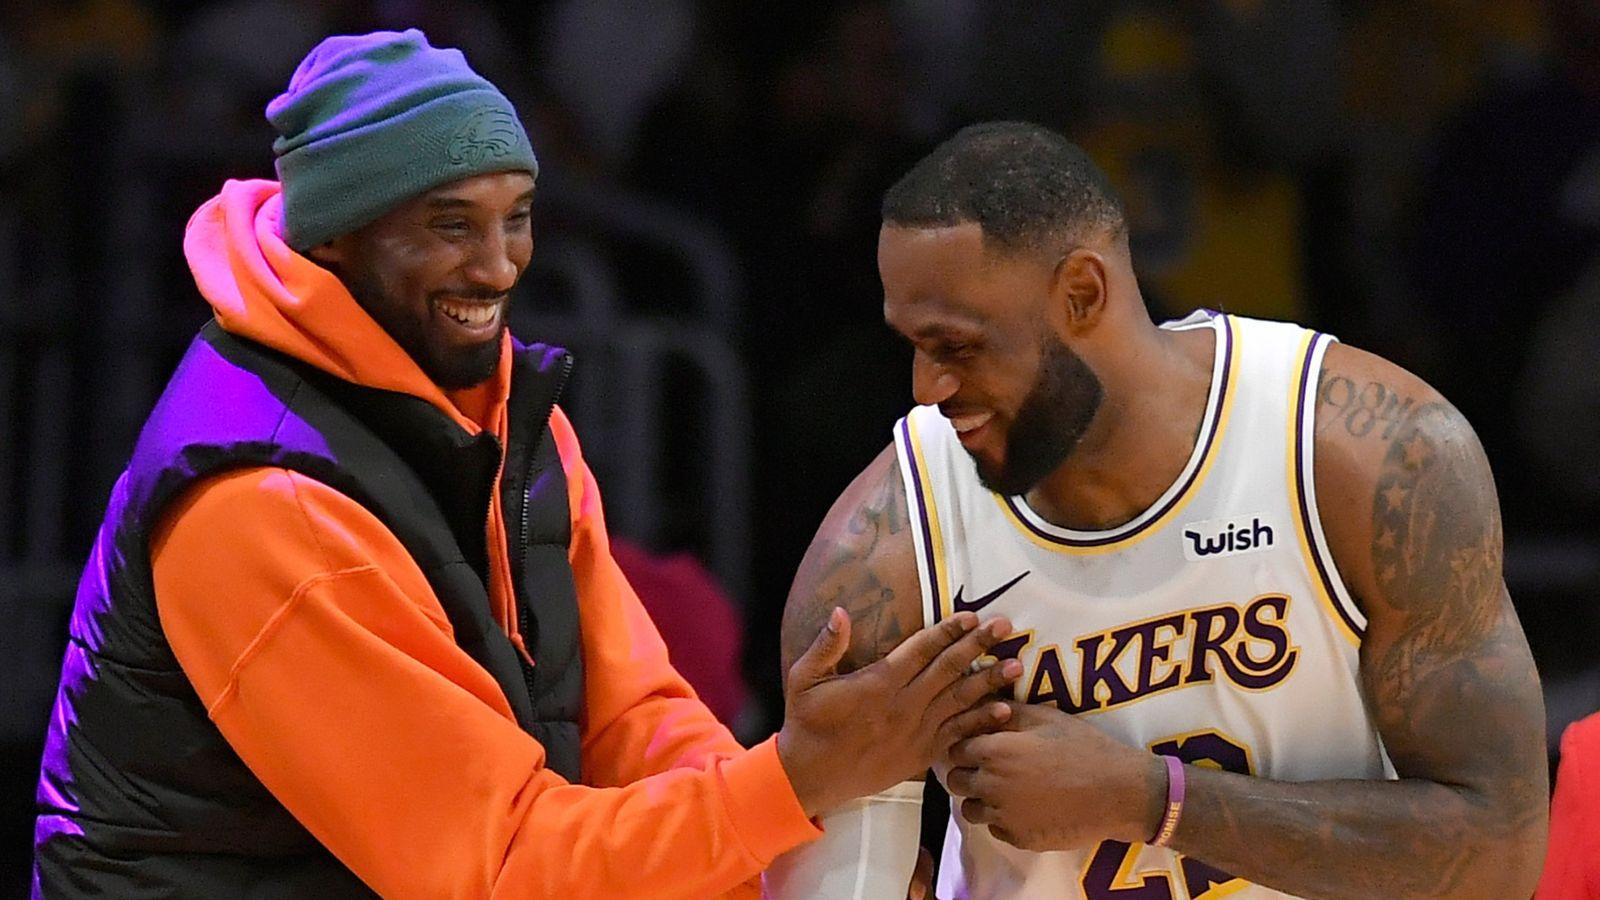 LeBron posts Kobe tribute